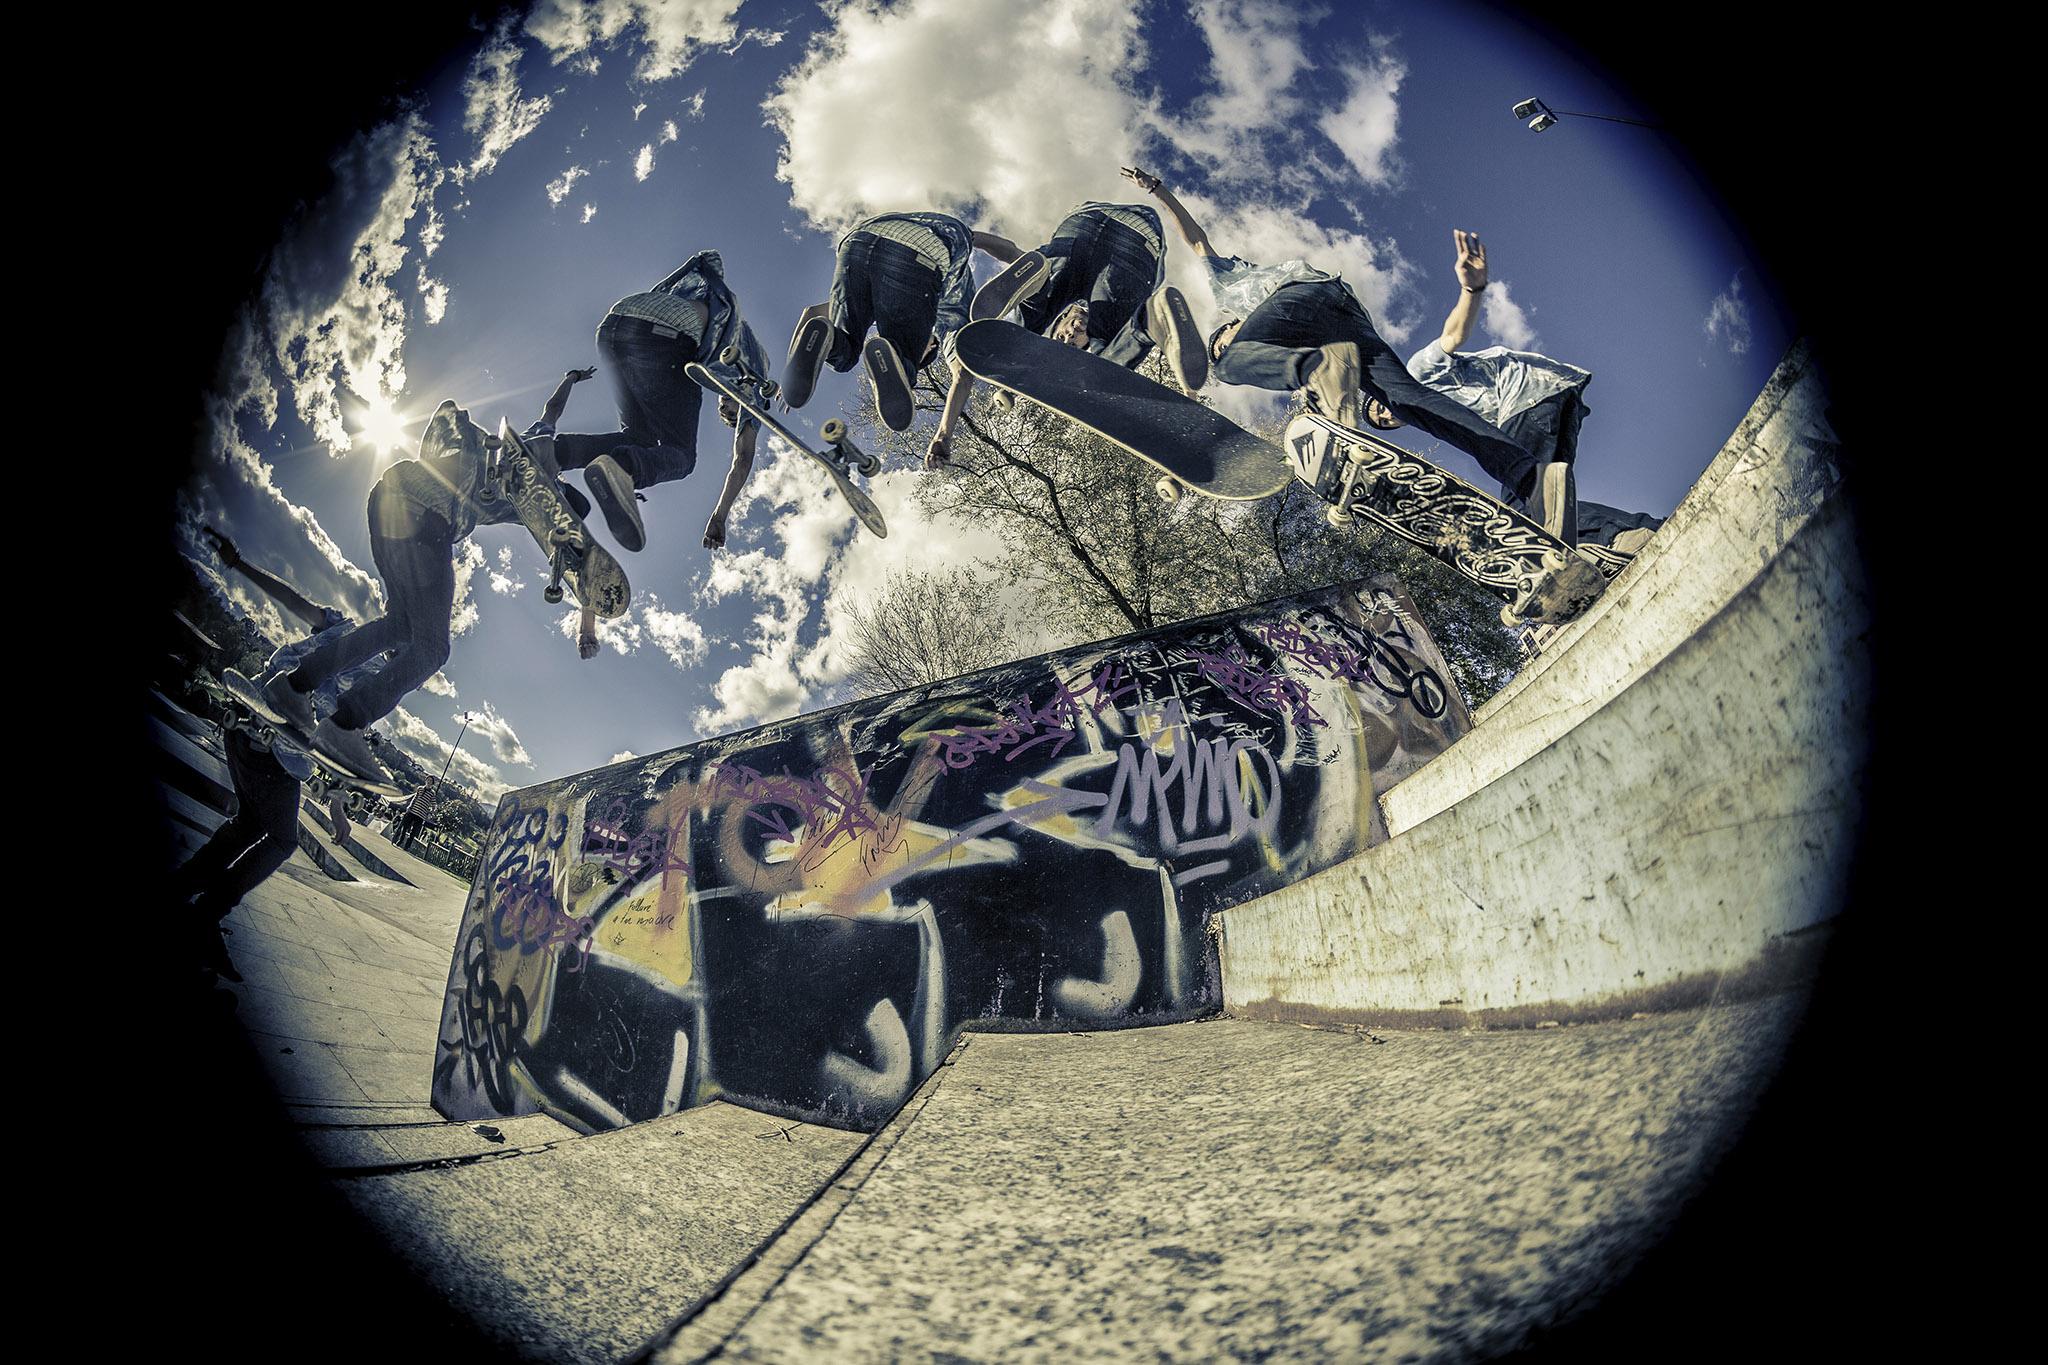 Oviedo_Skate_Day_Yeray_Menendez_MONTAJE_MORO_1